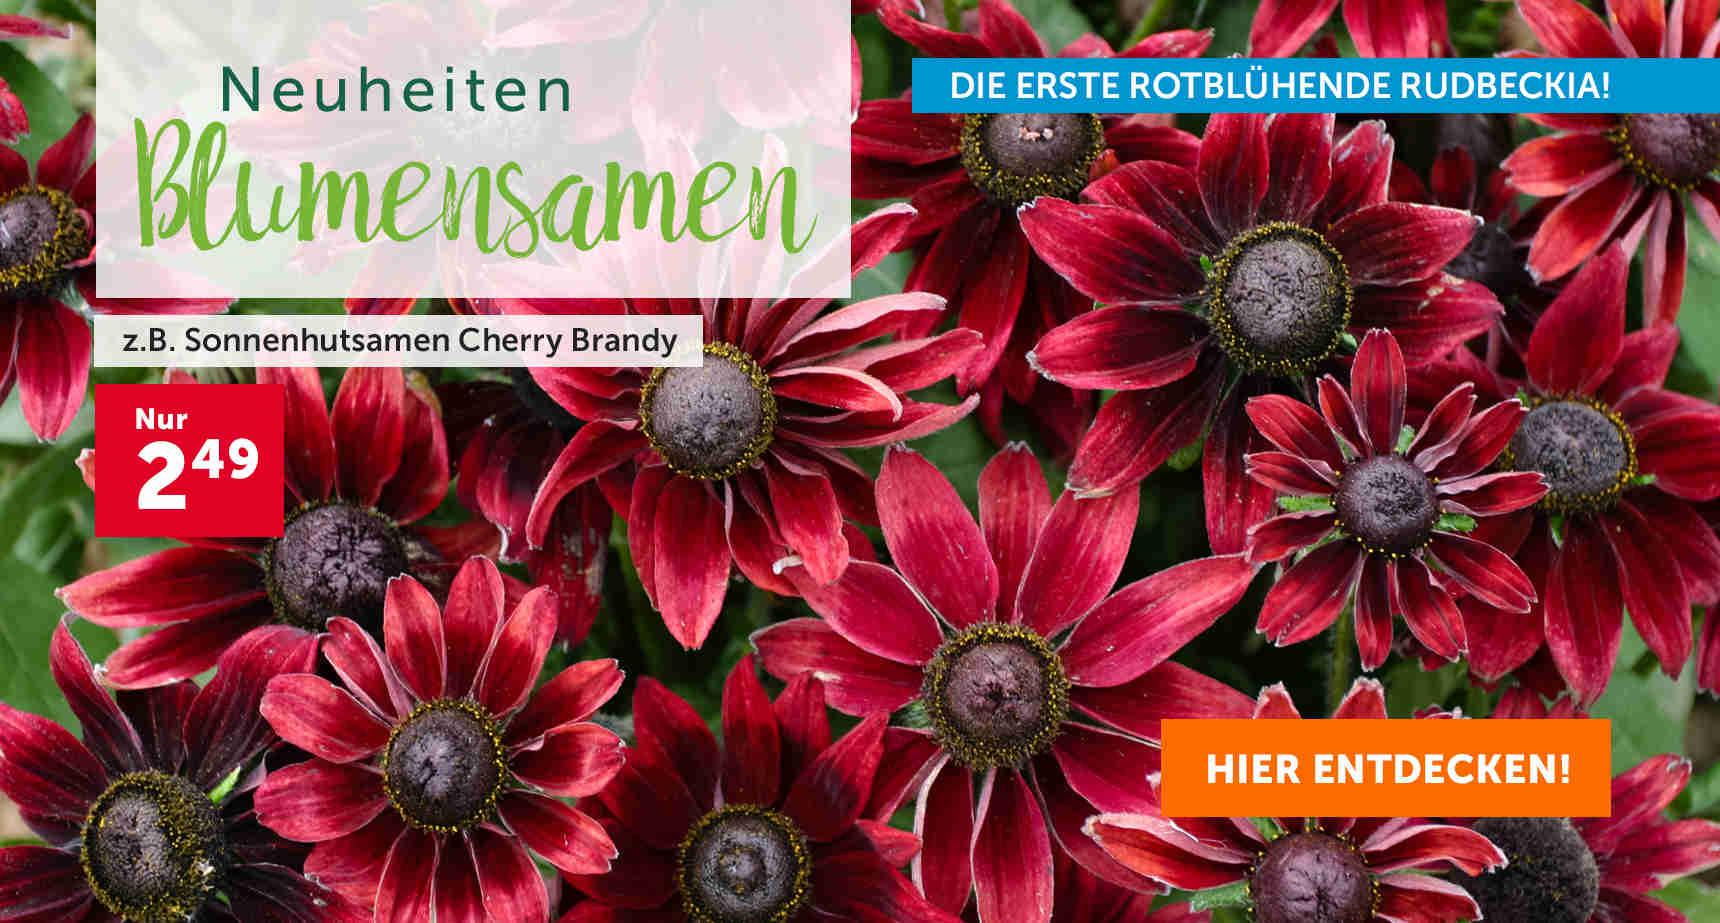 +++ (3) Blumensamen +++ - 3